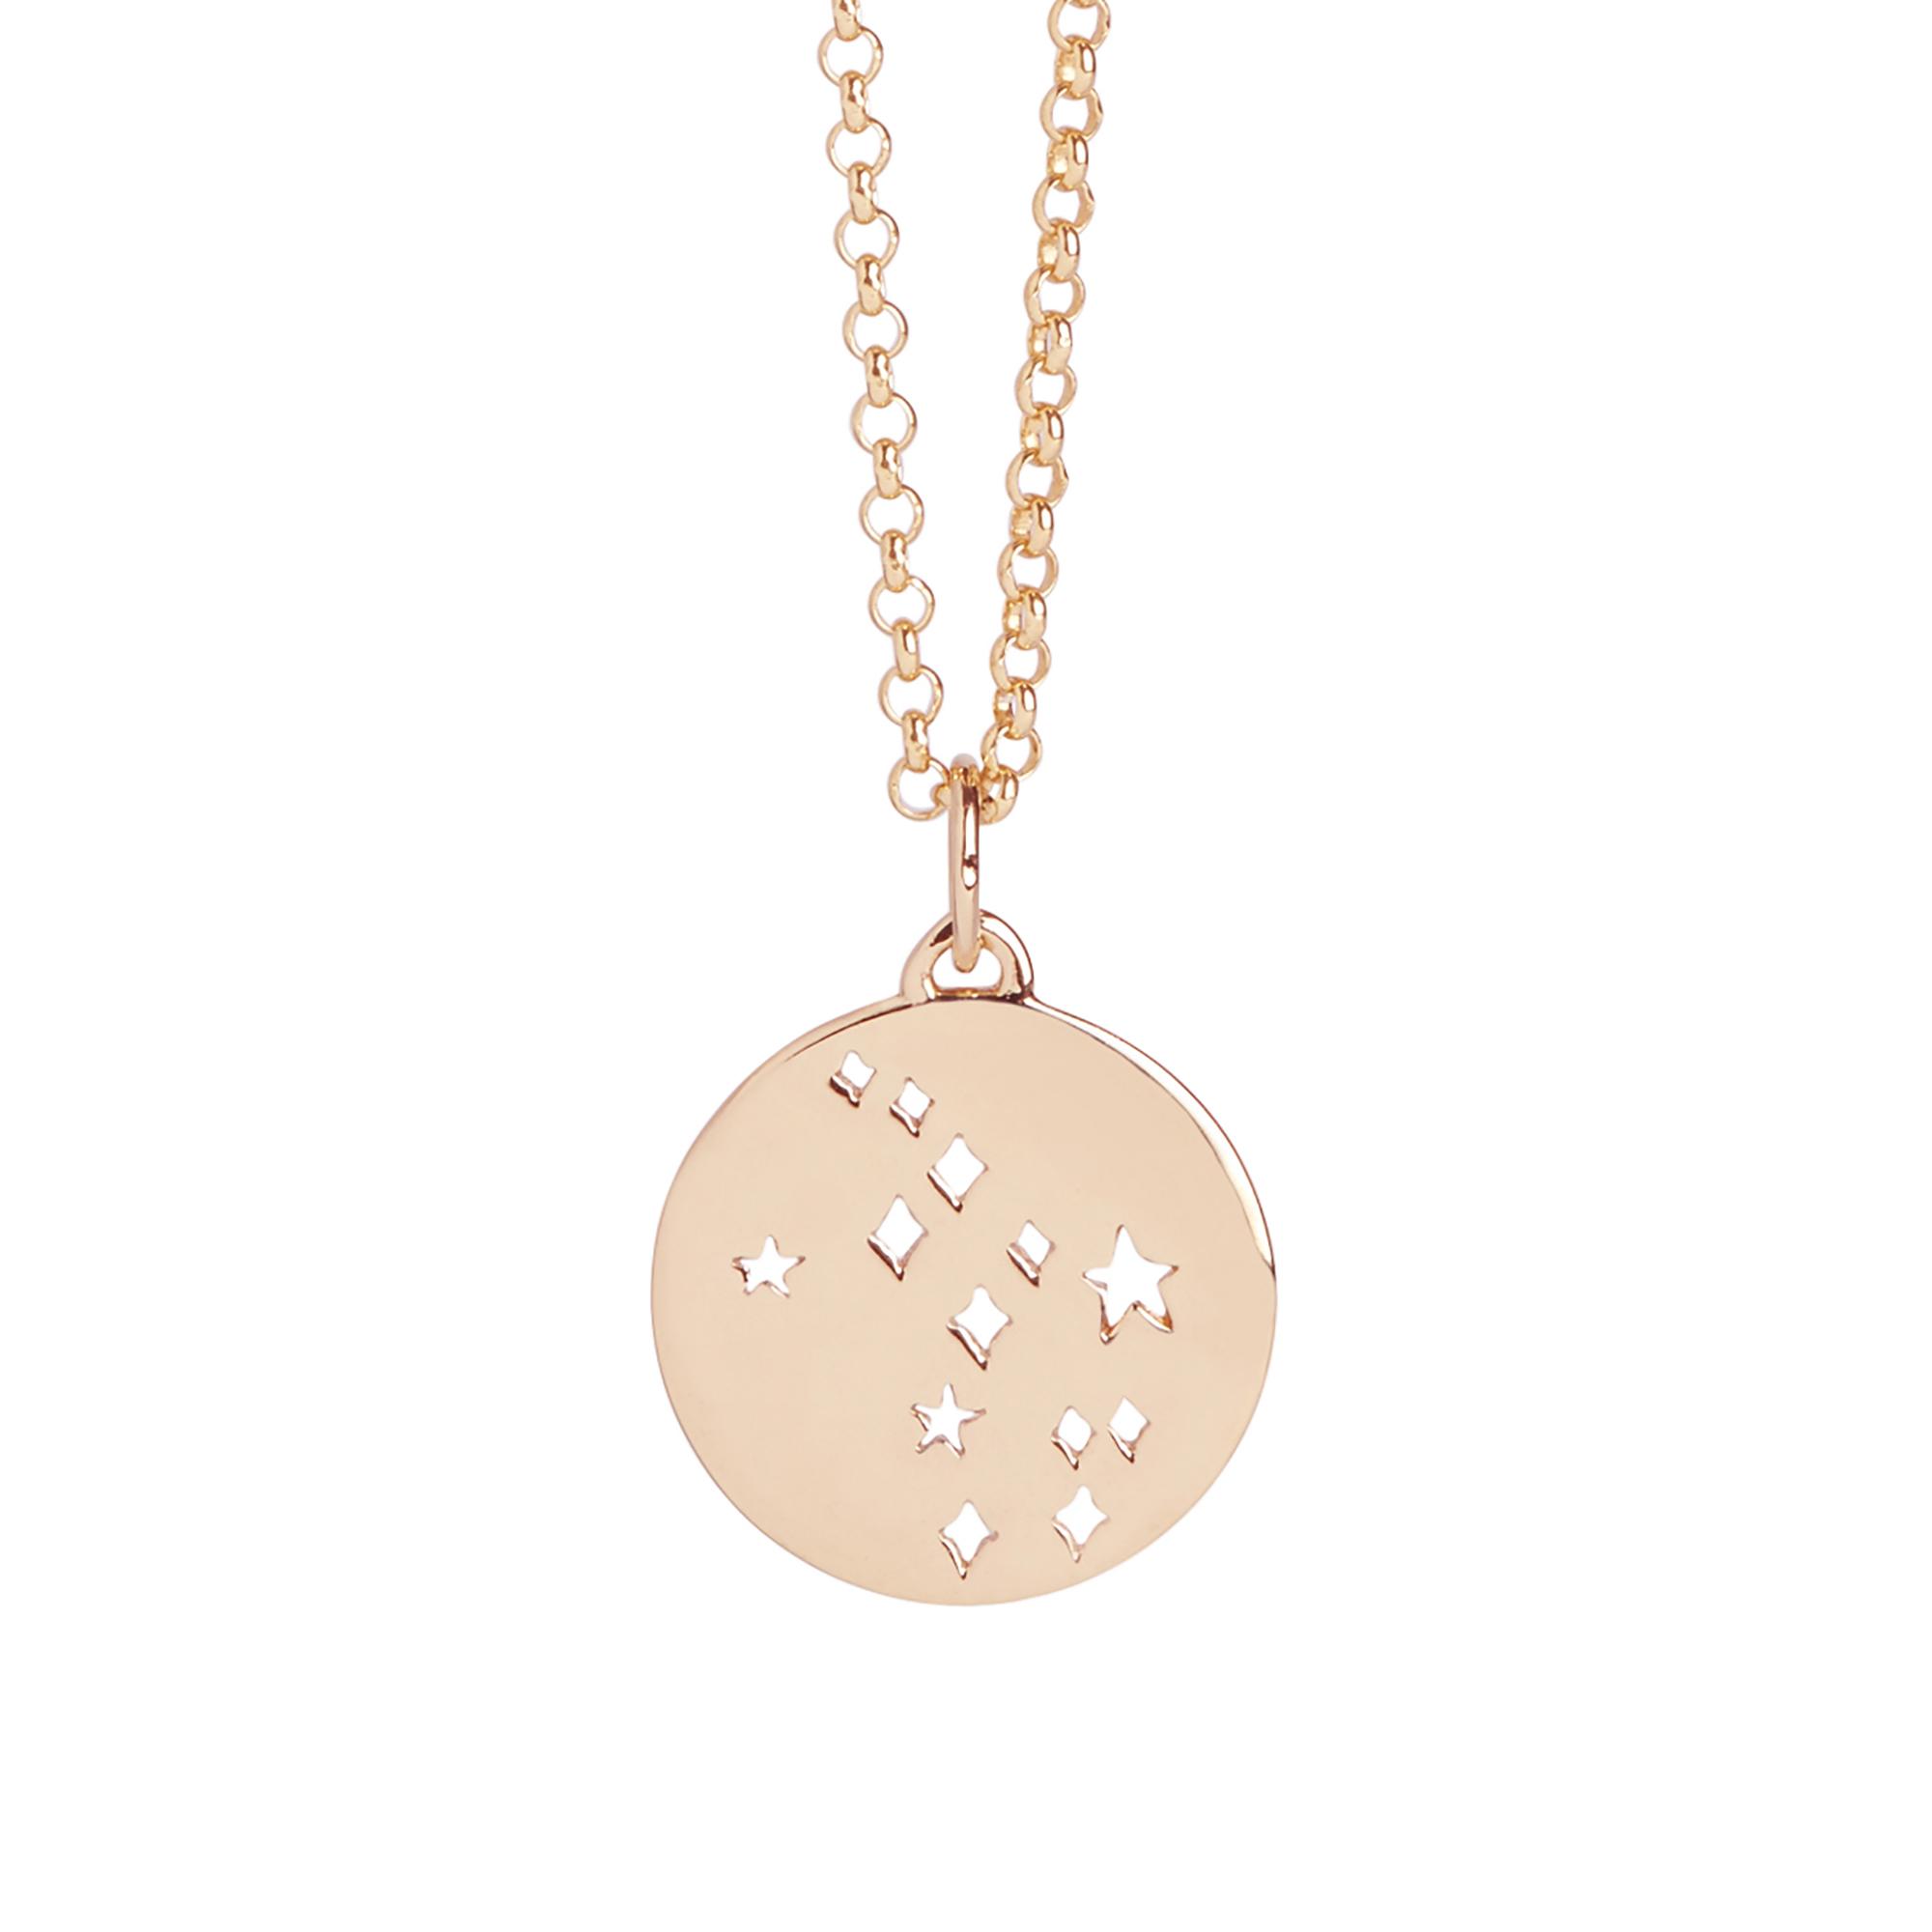 Muru Virgo Star Sign Necklace Rose Gold Plated